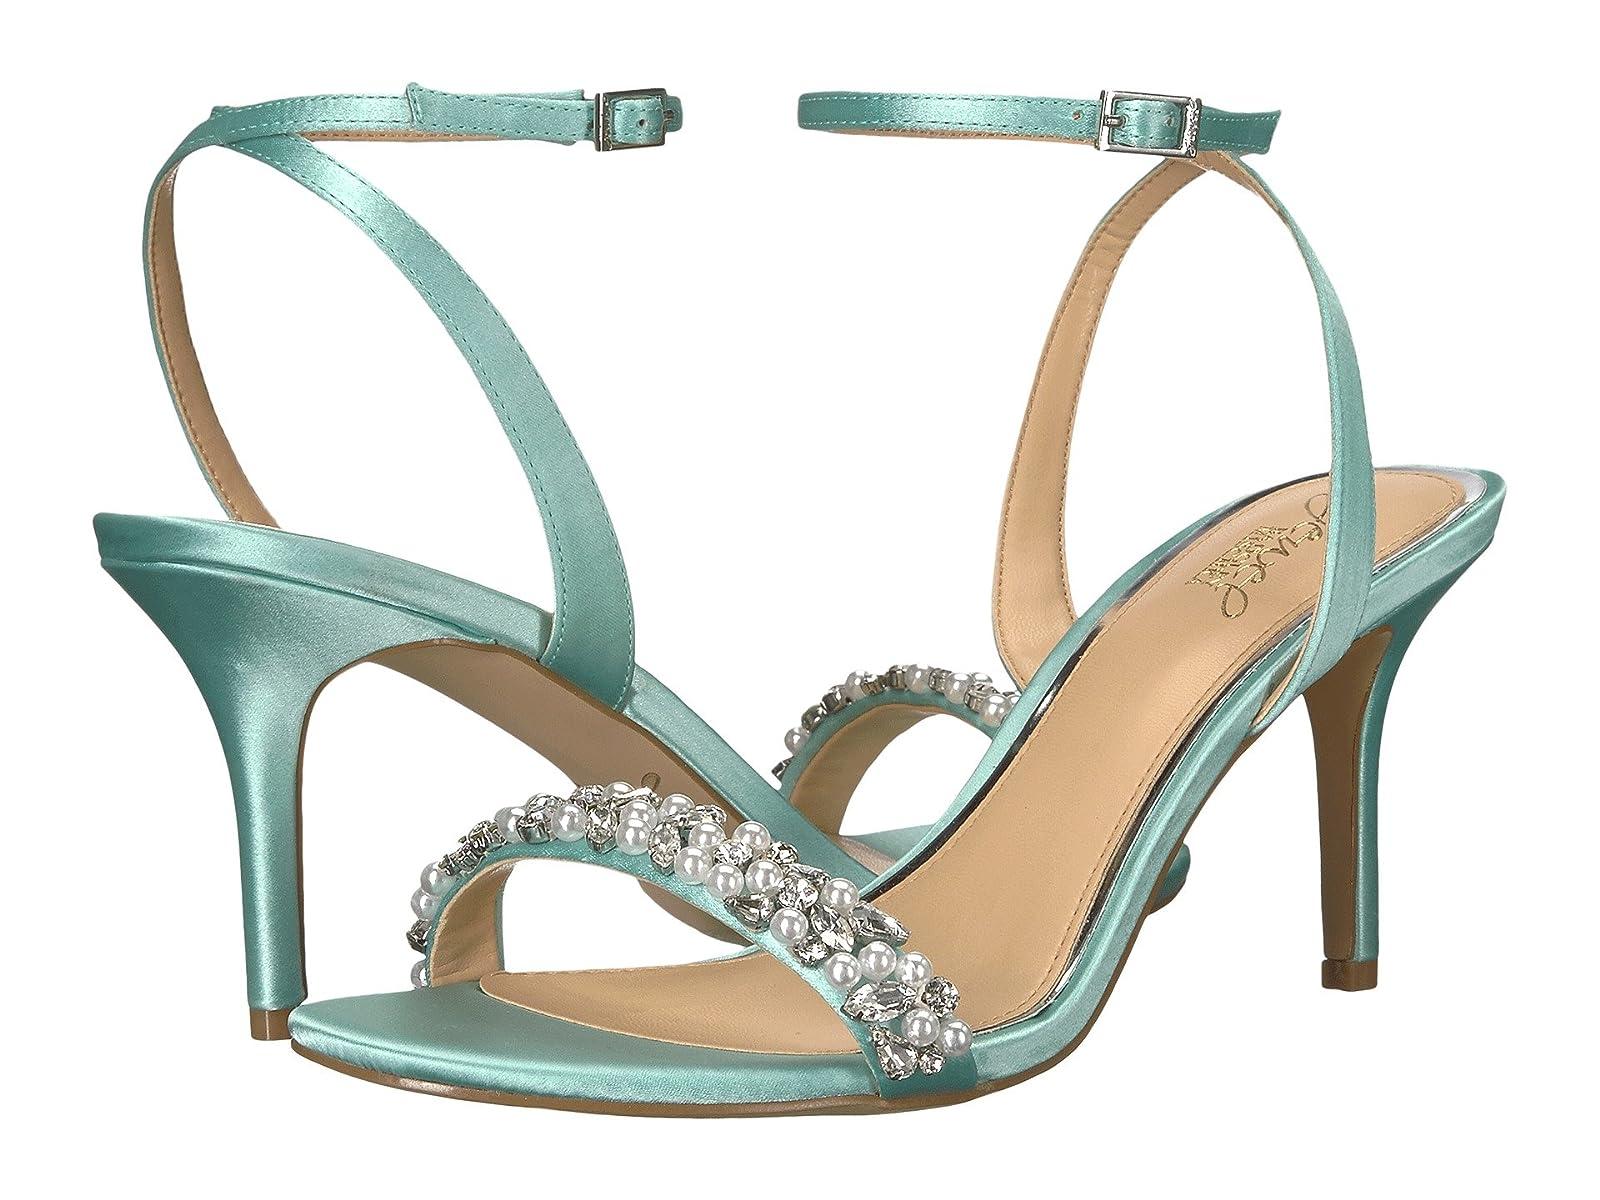 Jewel Badgley Mischka TheodoraCheap and distinctive eye-catching shoes